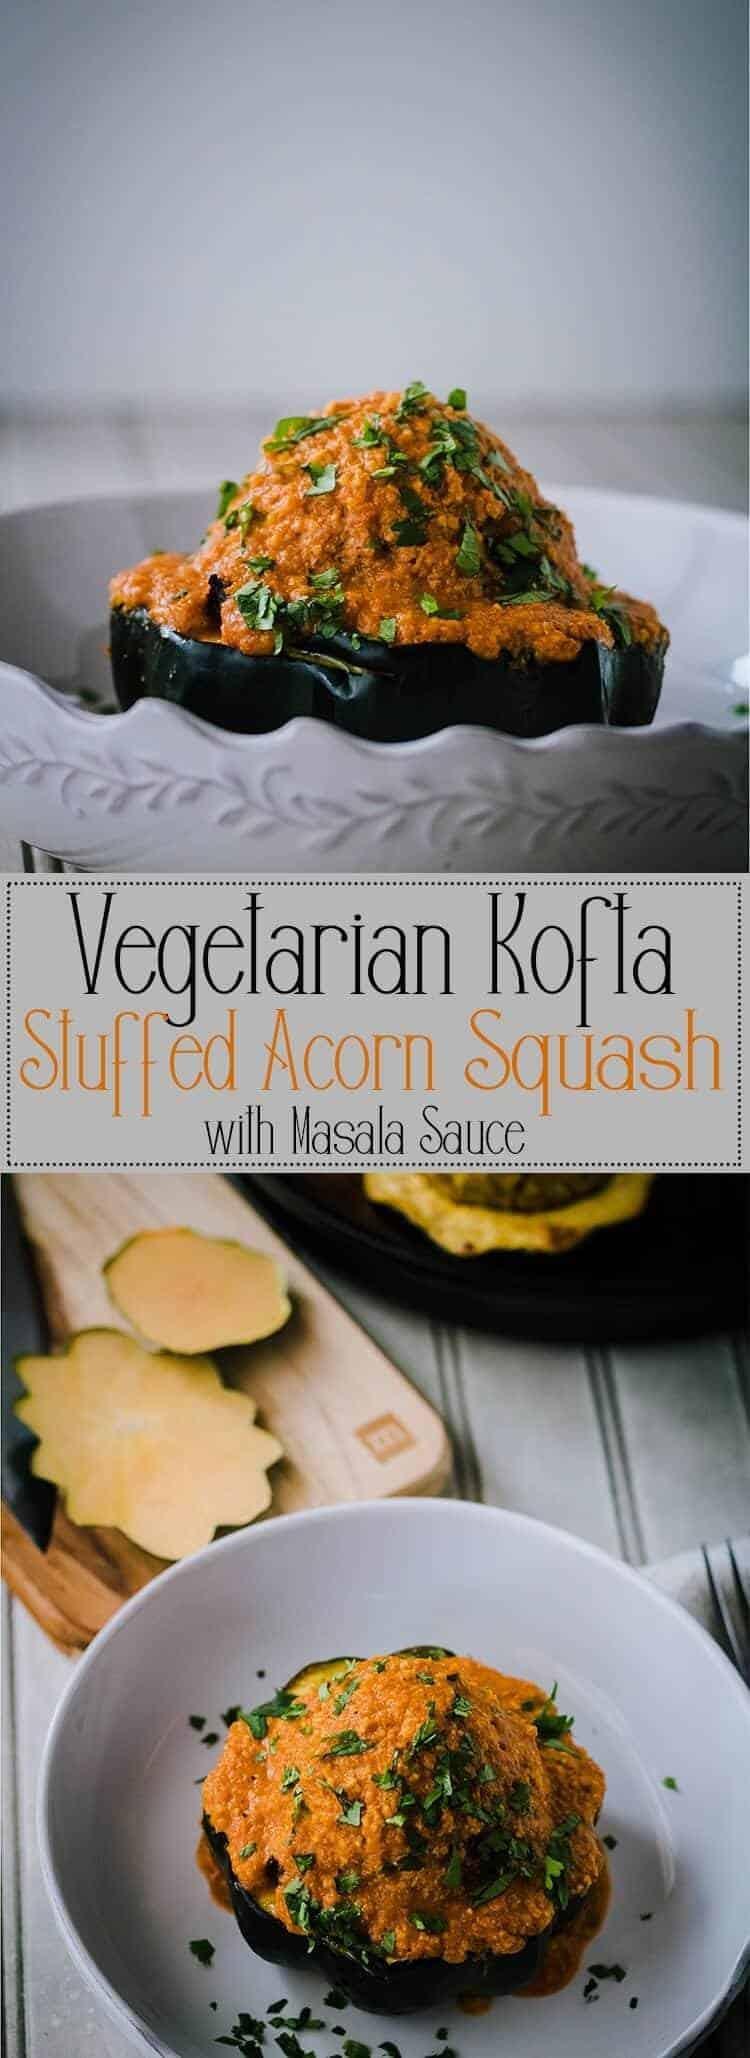 Vegetarian Kofta Stuffed Acorn Squash with Masala Sauce Pin -